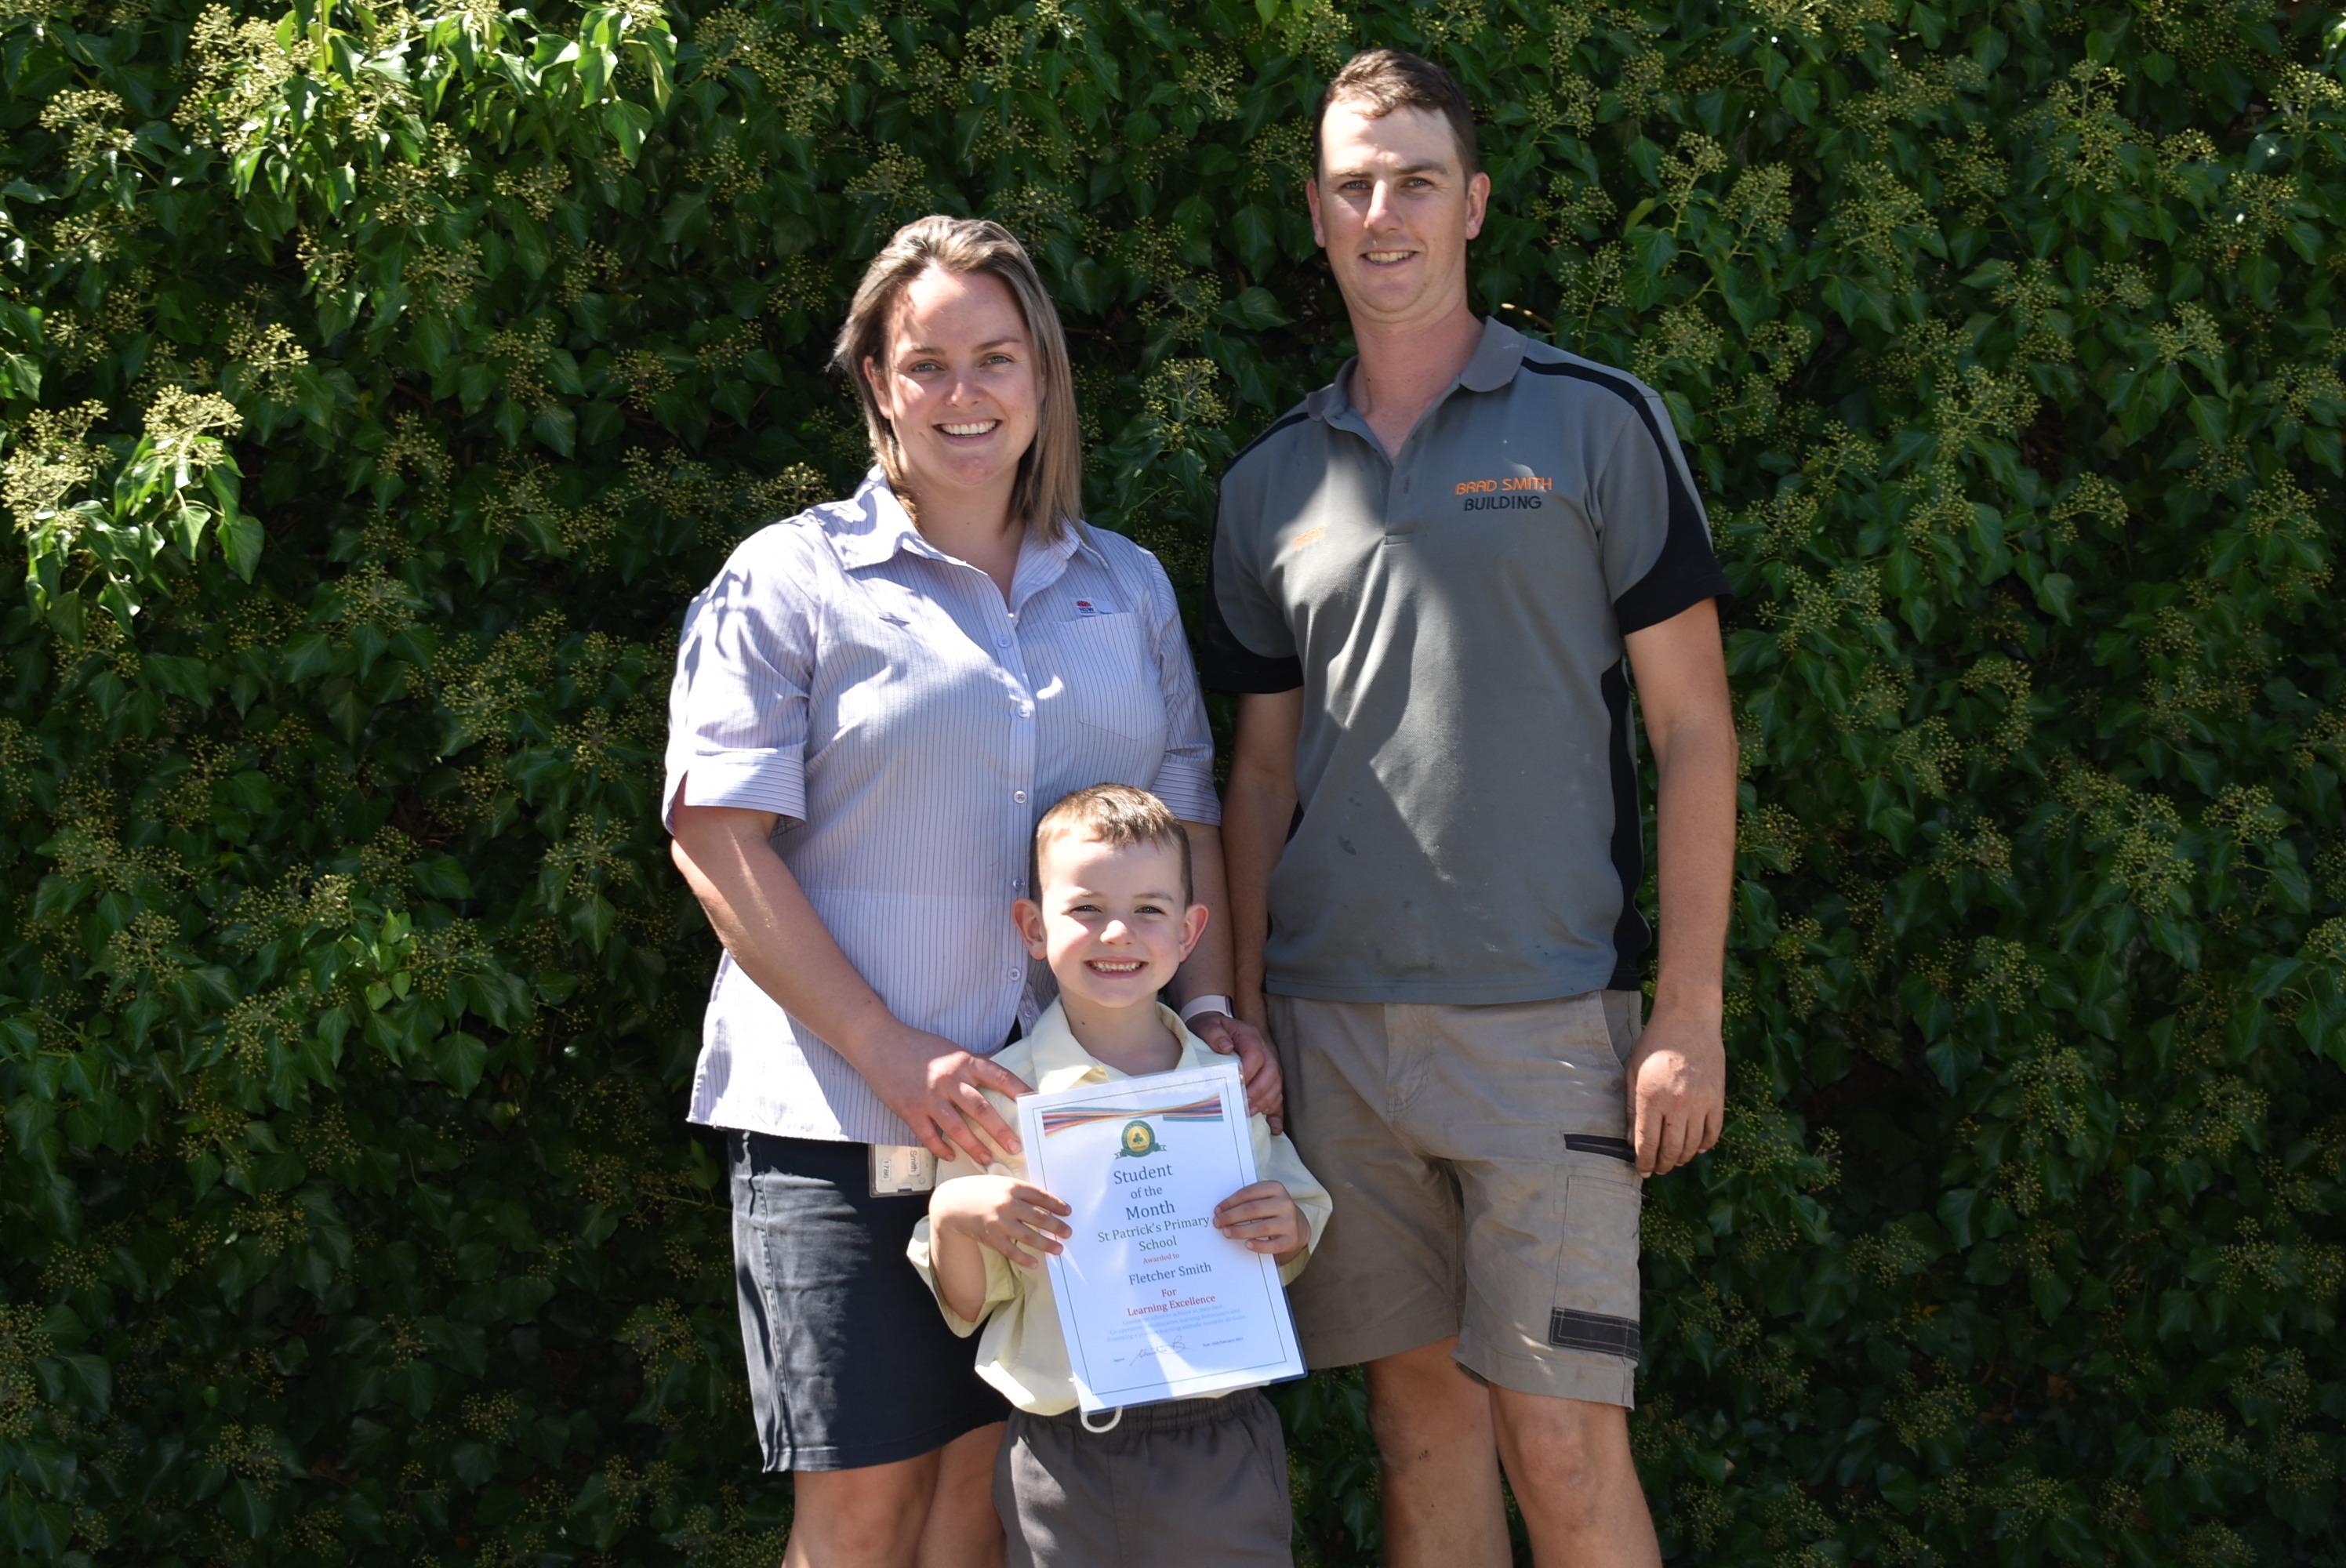 Fletcher with parents Wk 5 T1